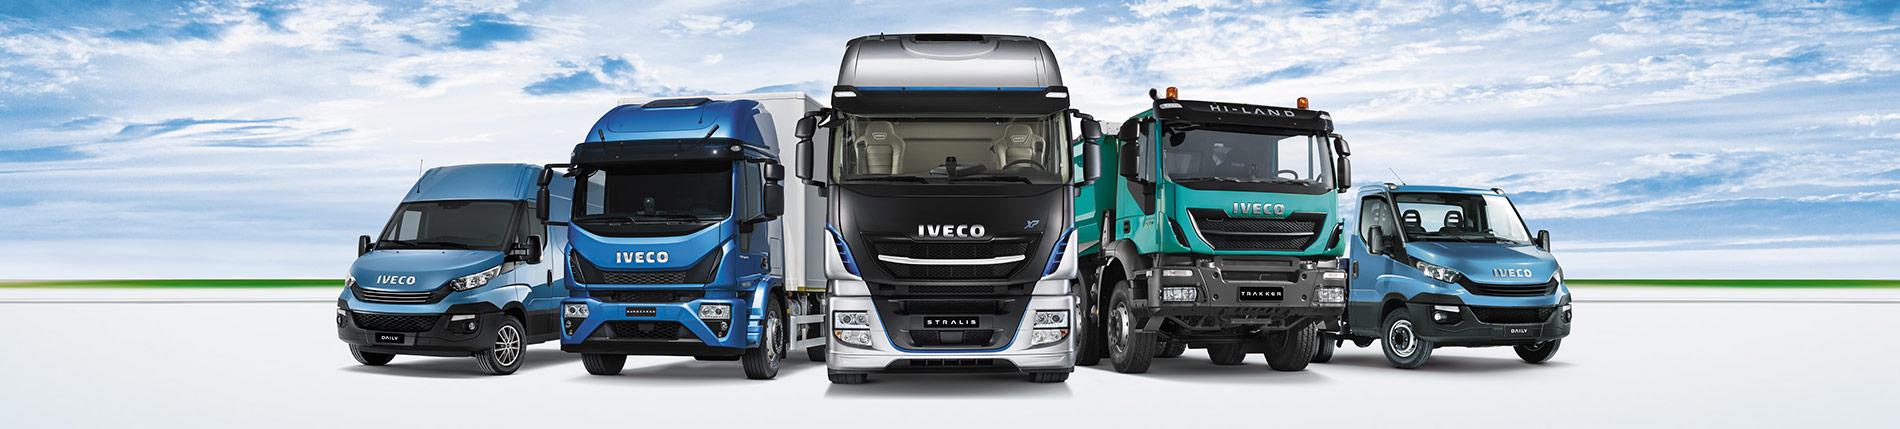 Vendita veicoli Nuovi Iveco Torino